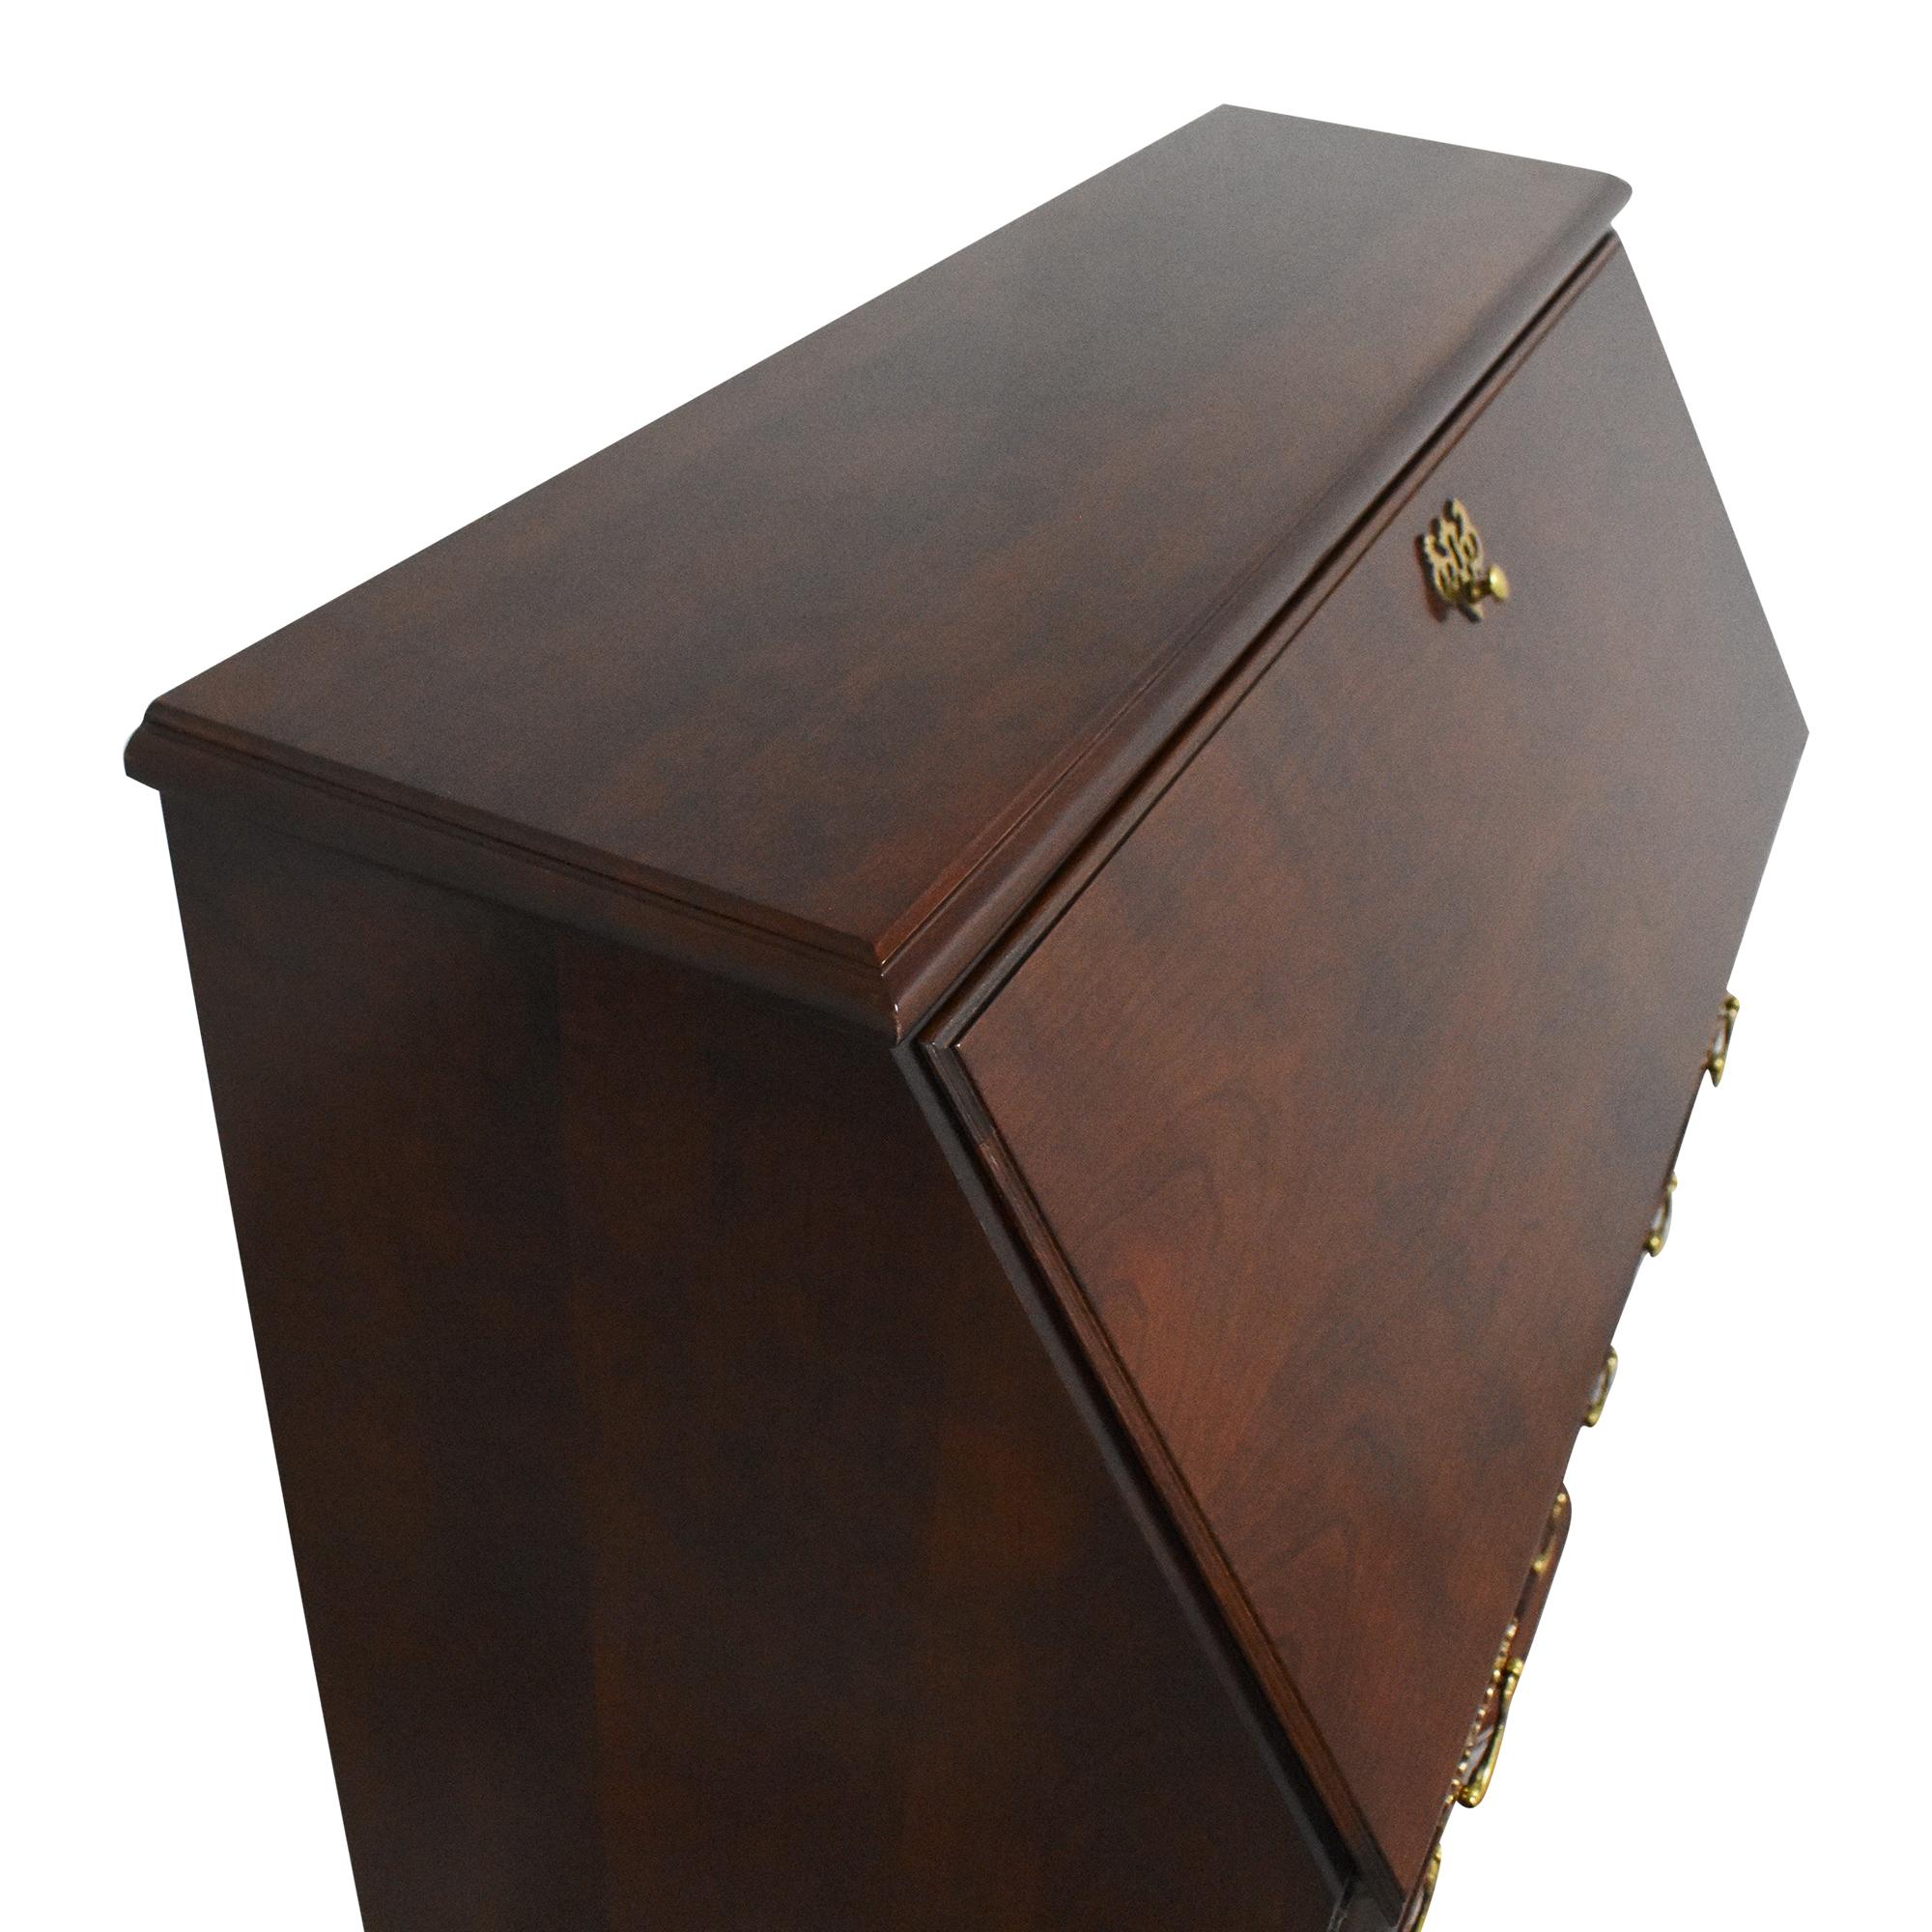 Jasper Cabinet Company Jasper Cabinet Company Slant Top Secretary Desk used